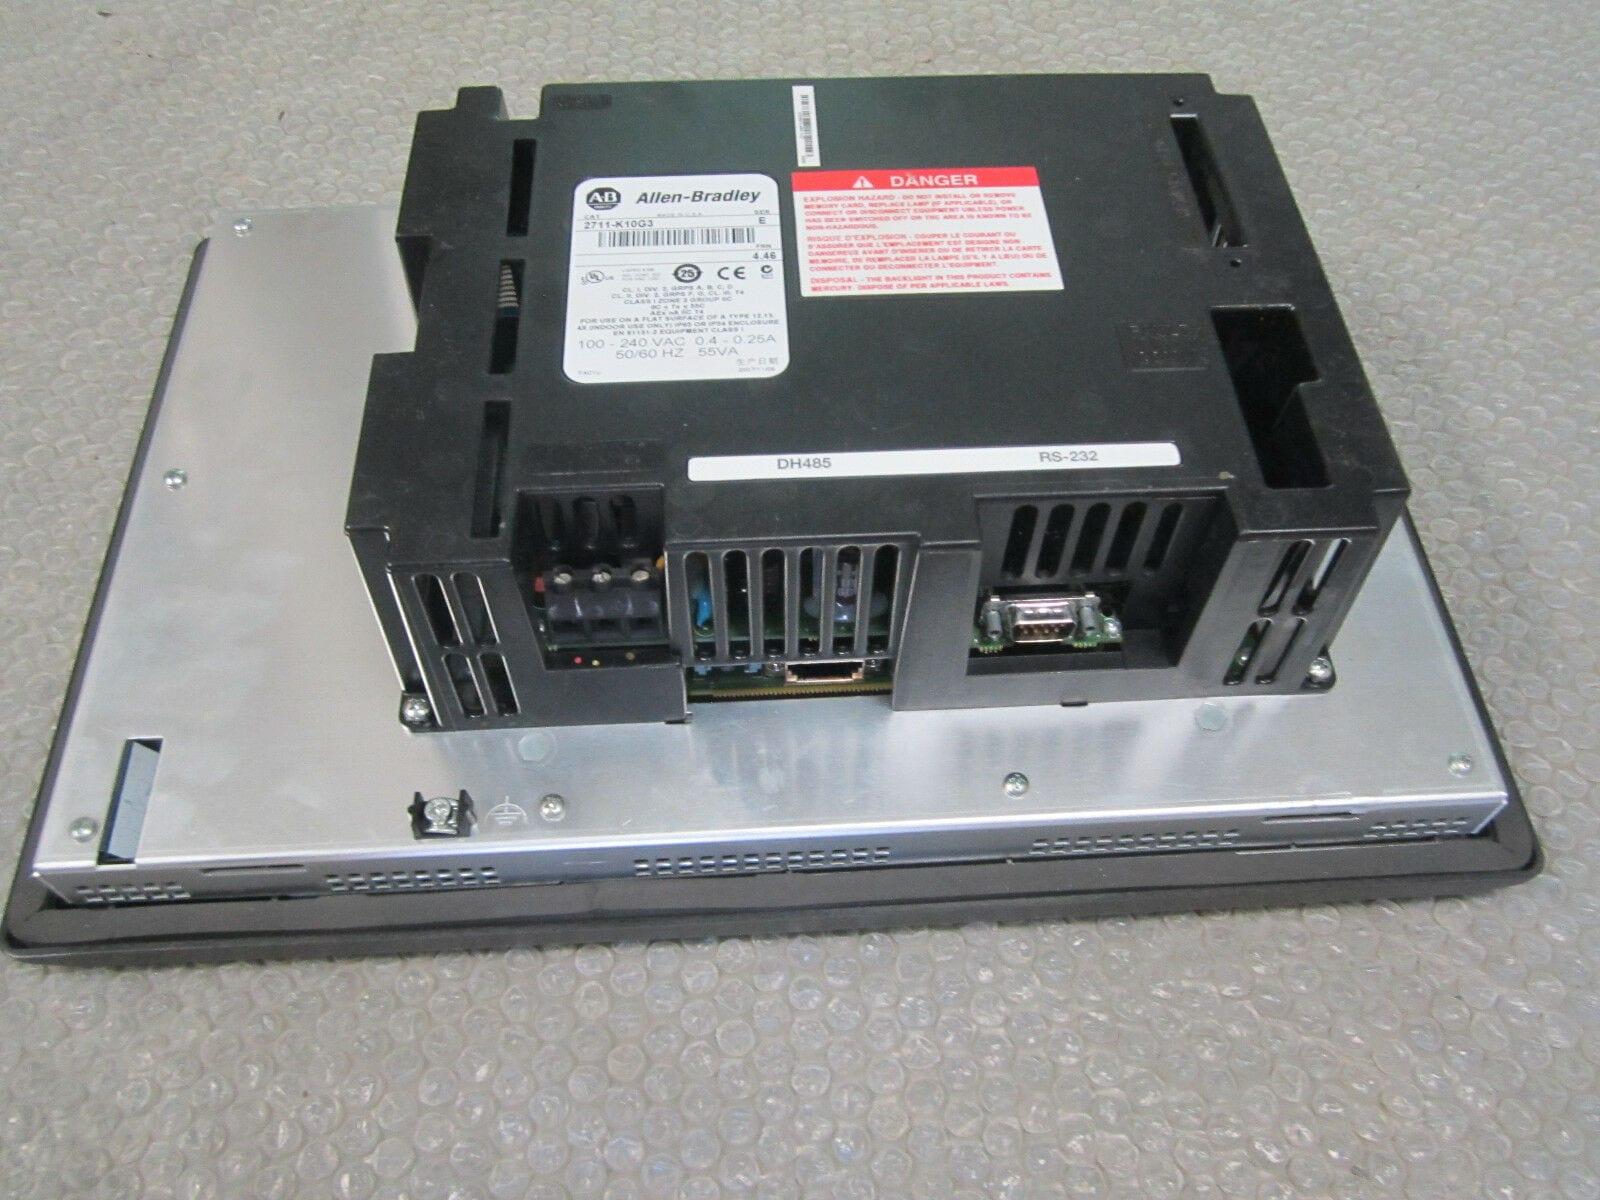 Allen Bradley 2711-K10G3 Panelview 1000 Display Ser E FRN 4 46  100-240AC*Tested*